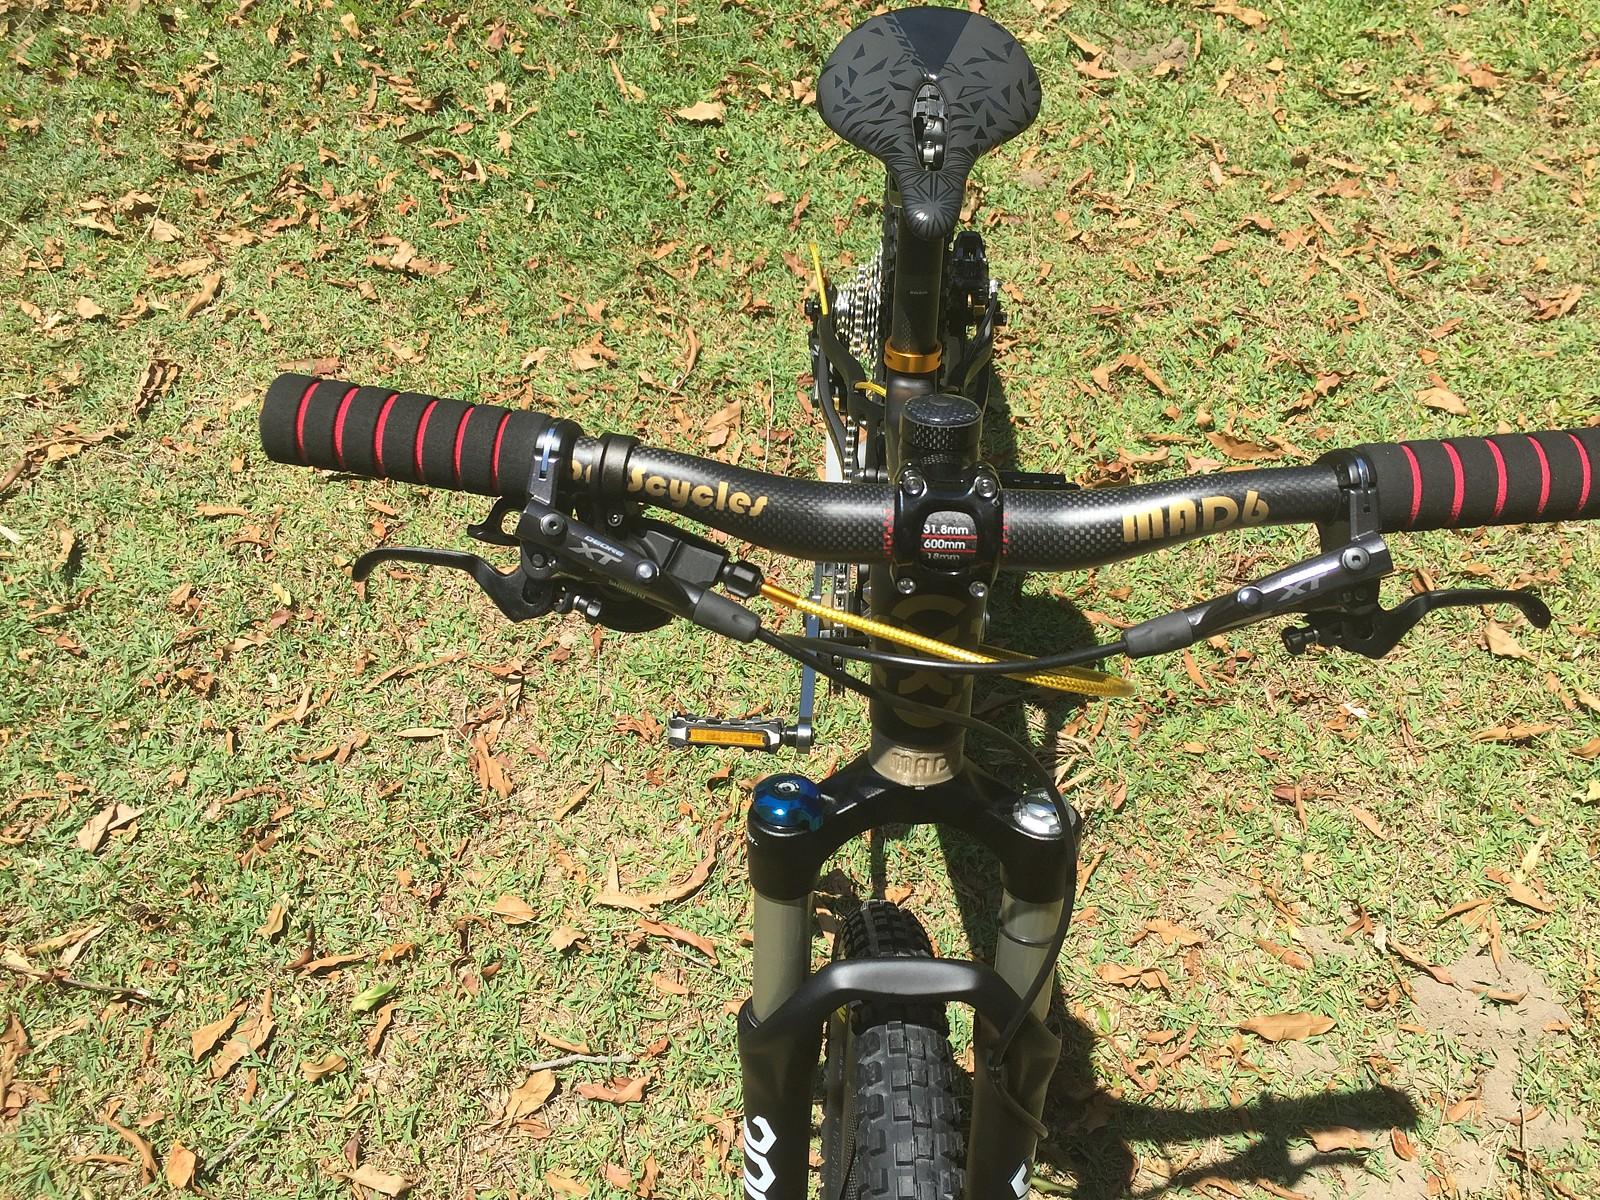 IMG 4195 - CarbonXScycles - Mountain Biking Pictures - Vital MTB